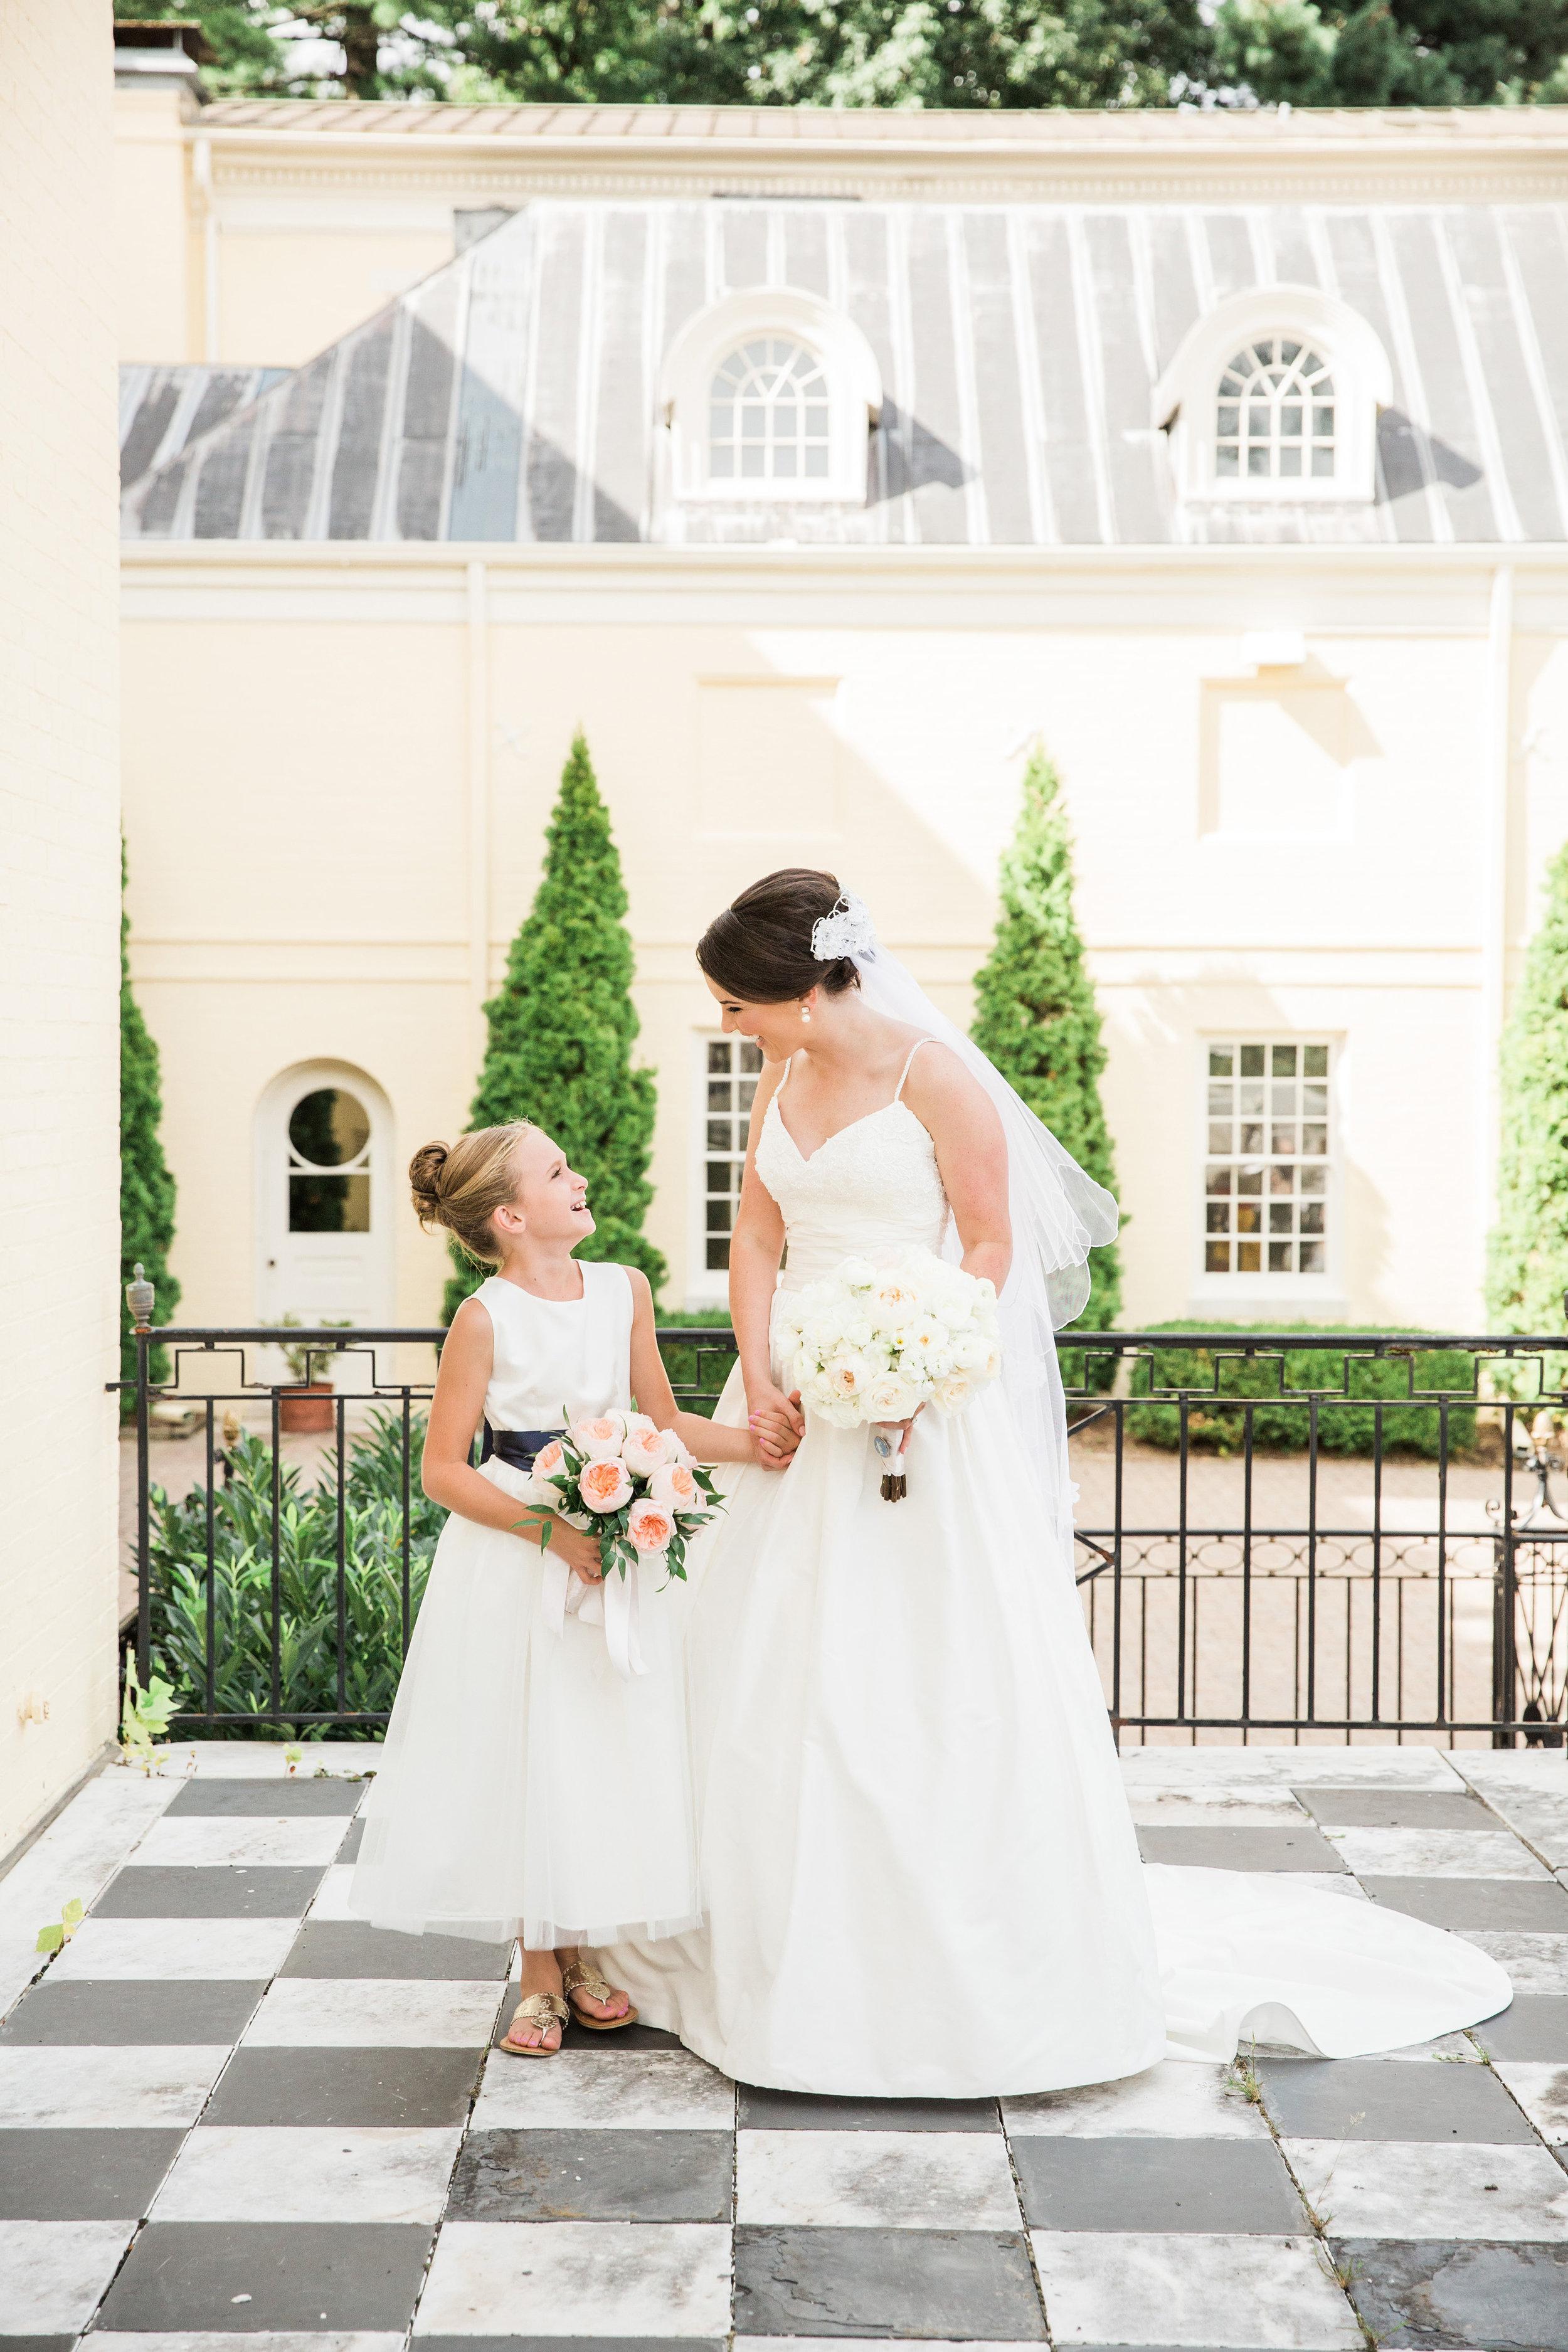 Evergreen-Museum-Balitmore-Maryland-Wedding-Black-Tie-Bride-019.jpg